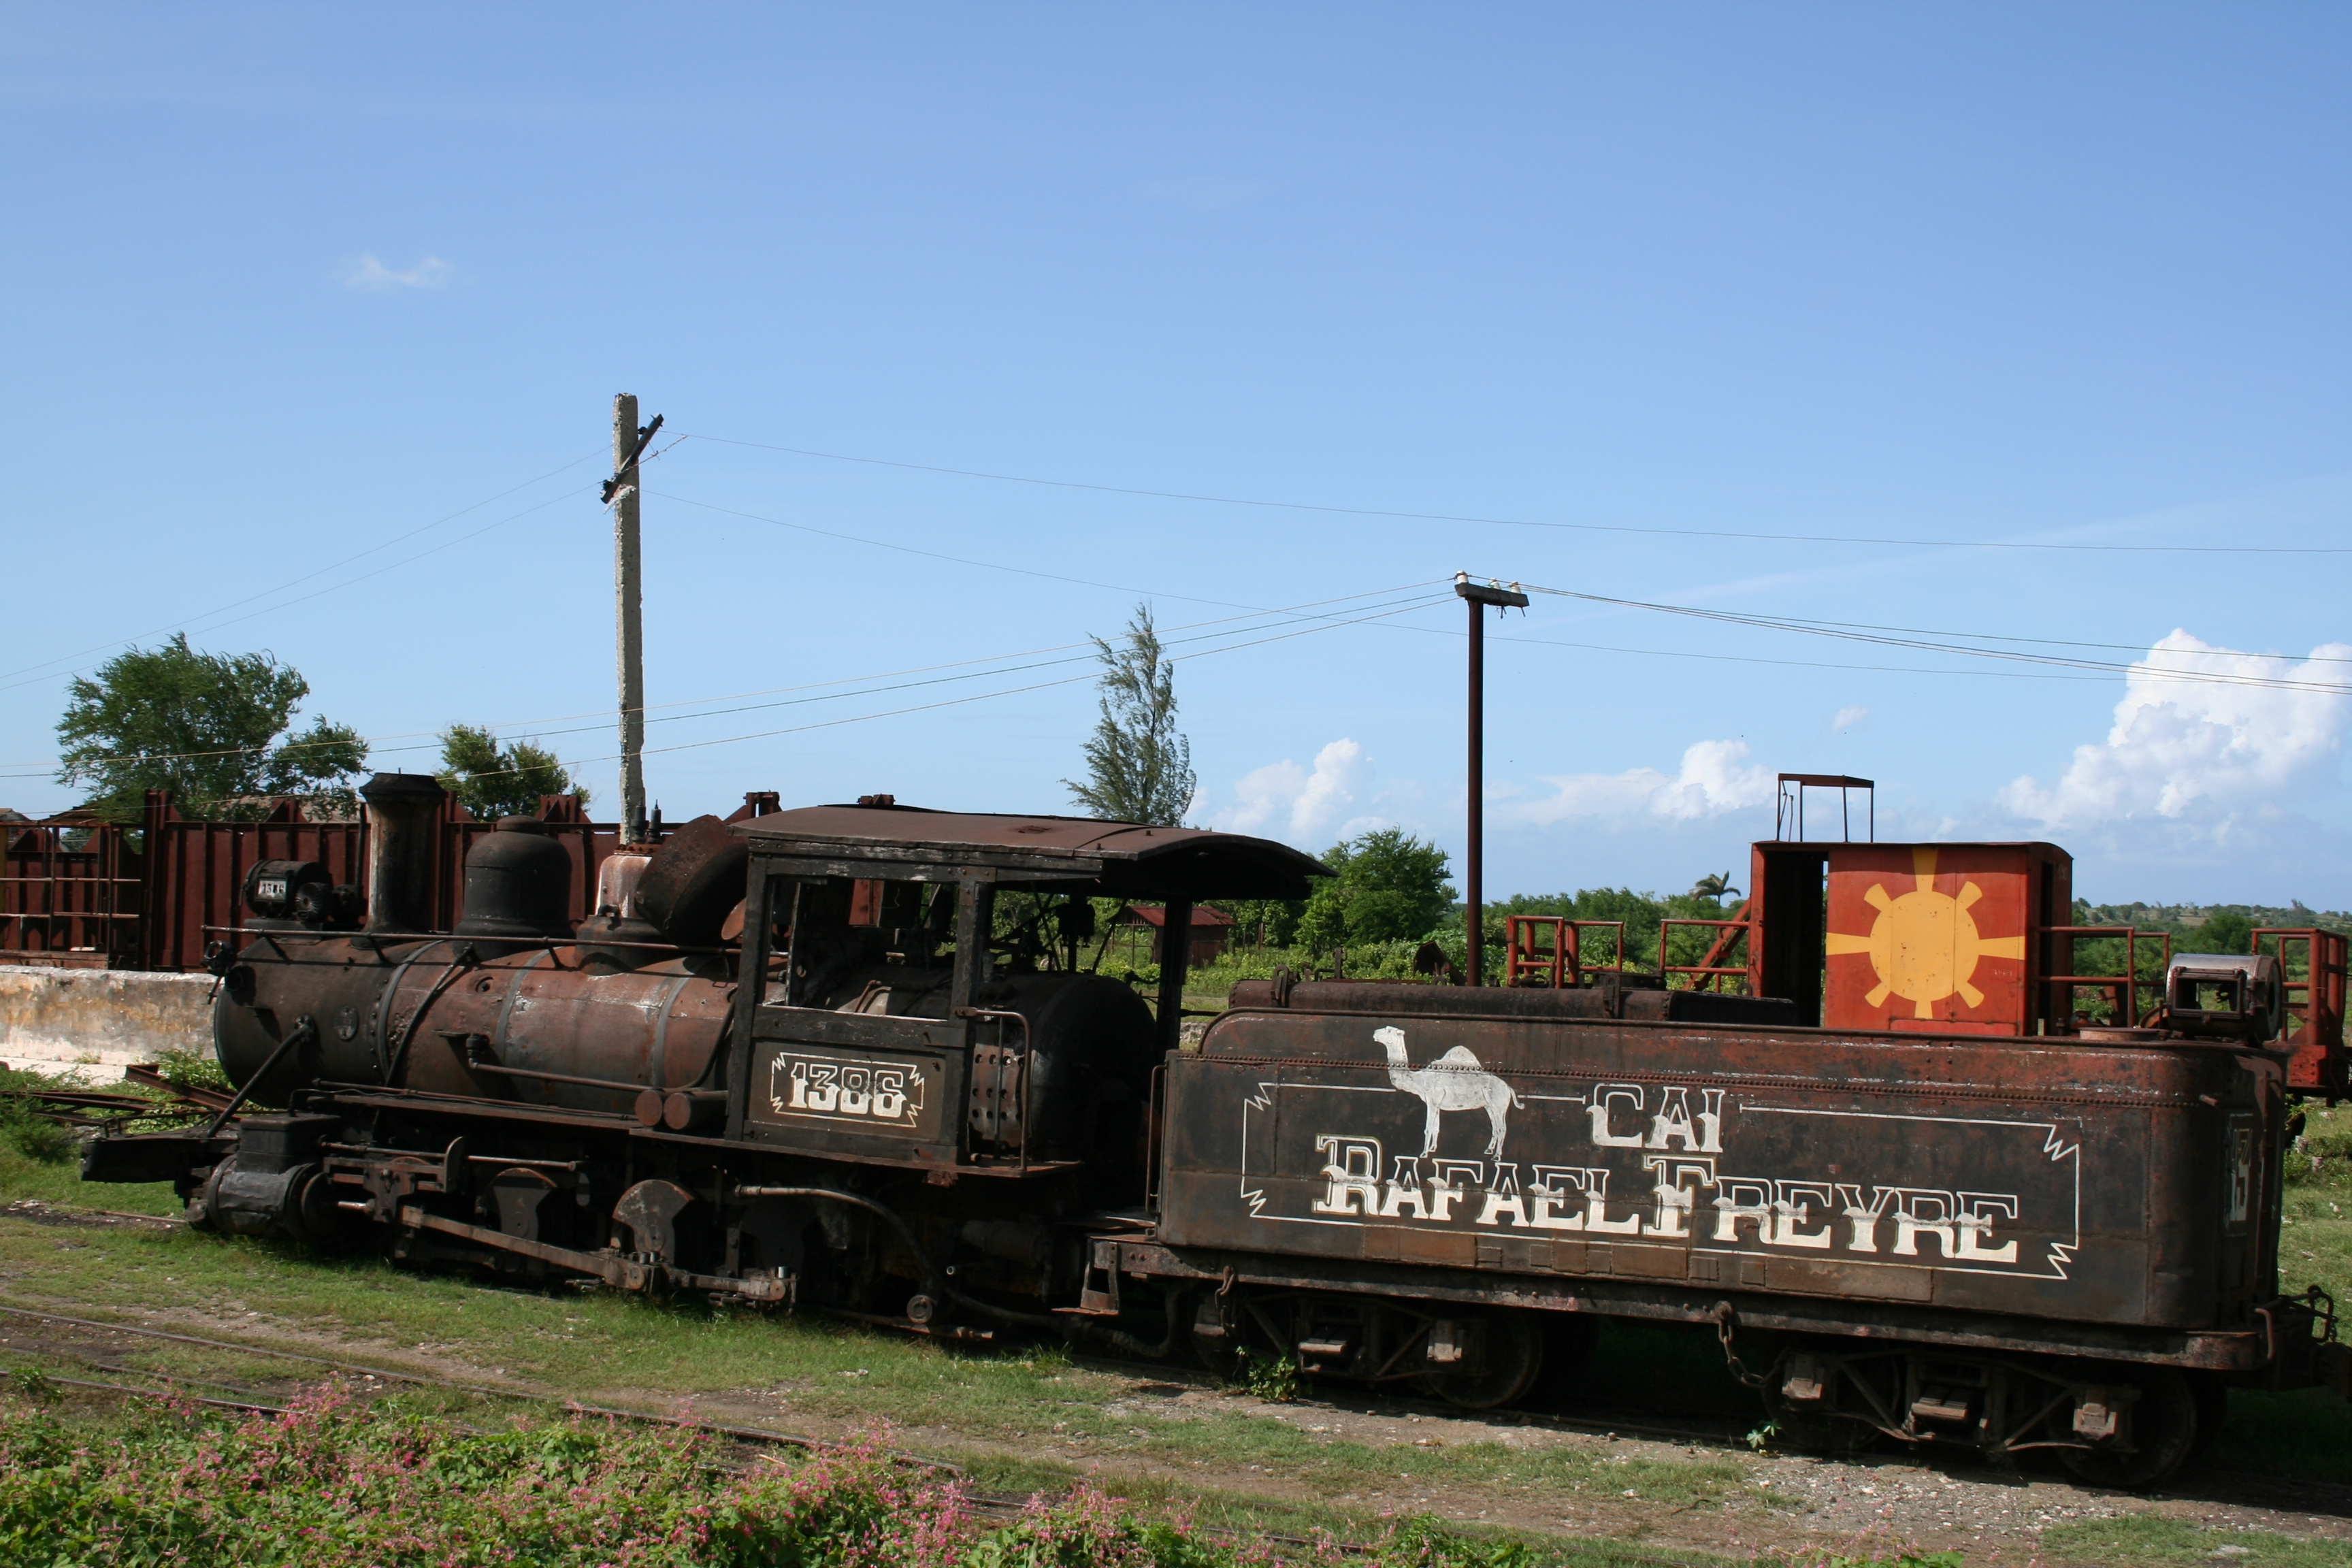 File:Rafael freyre steam loco 1386.jpg